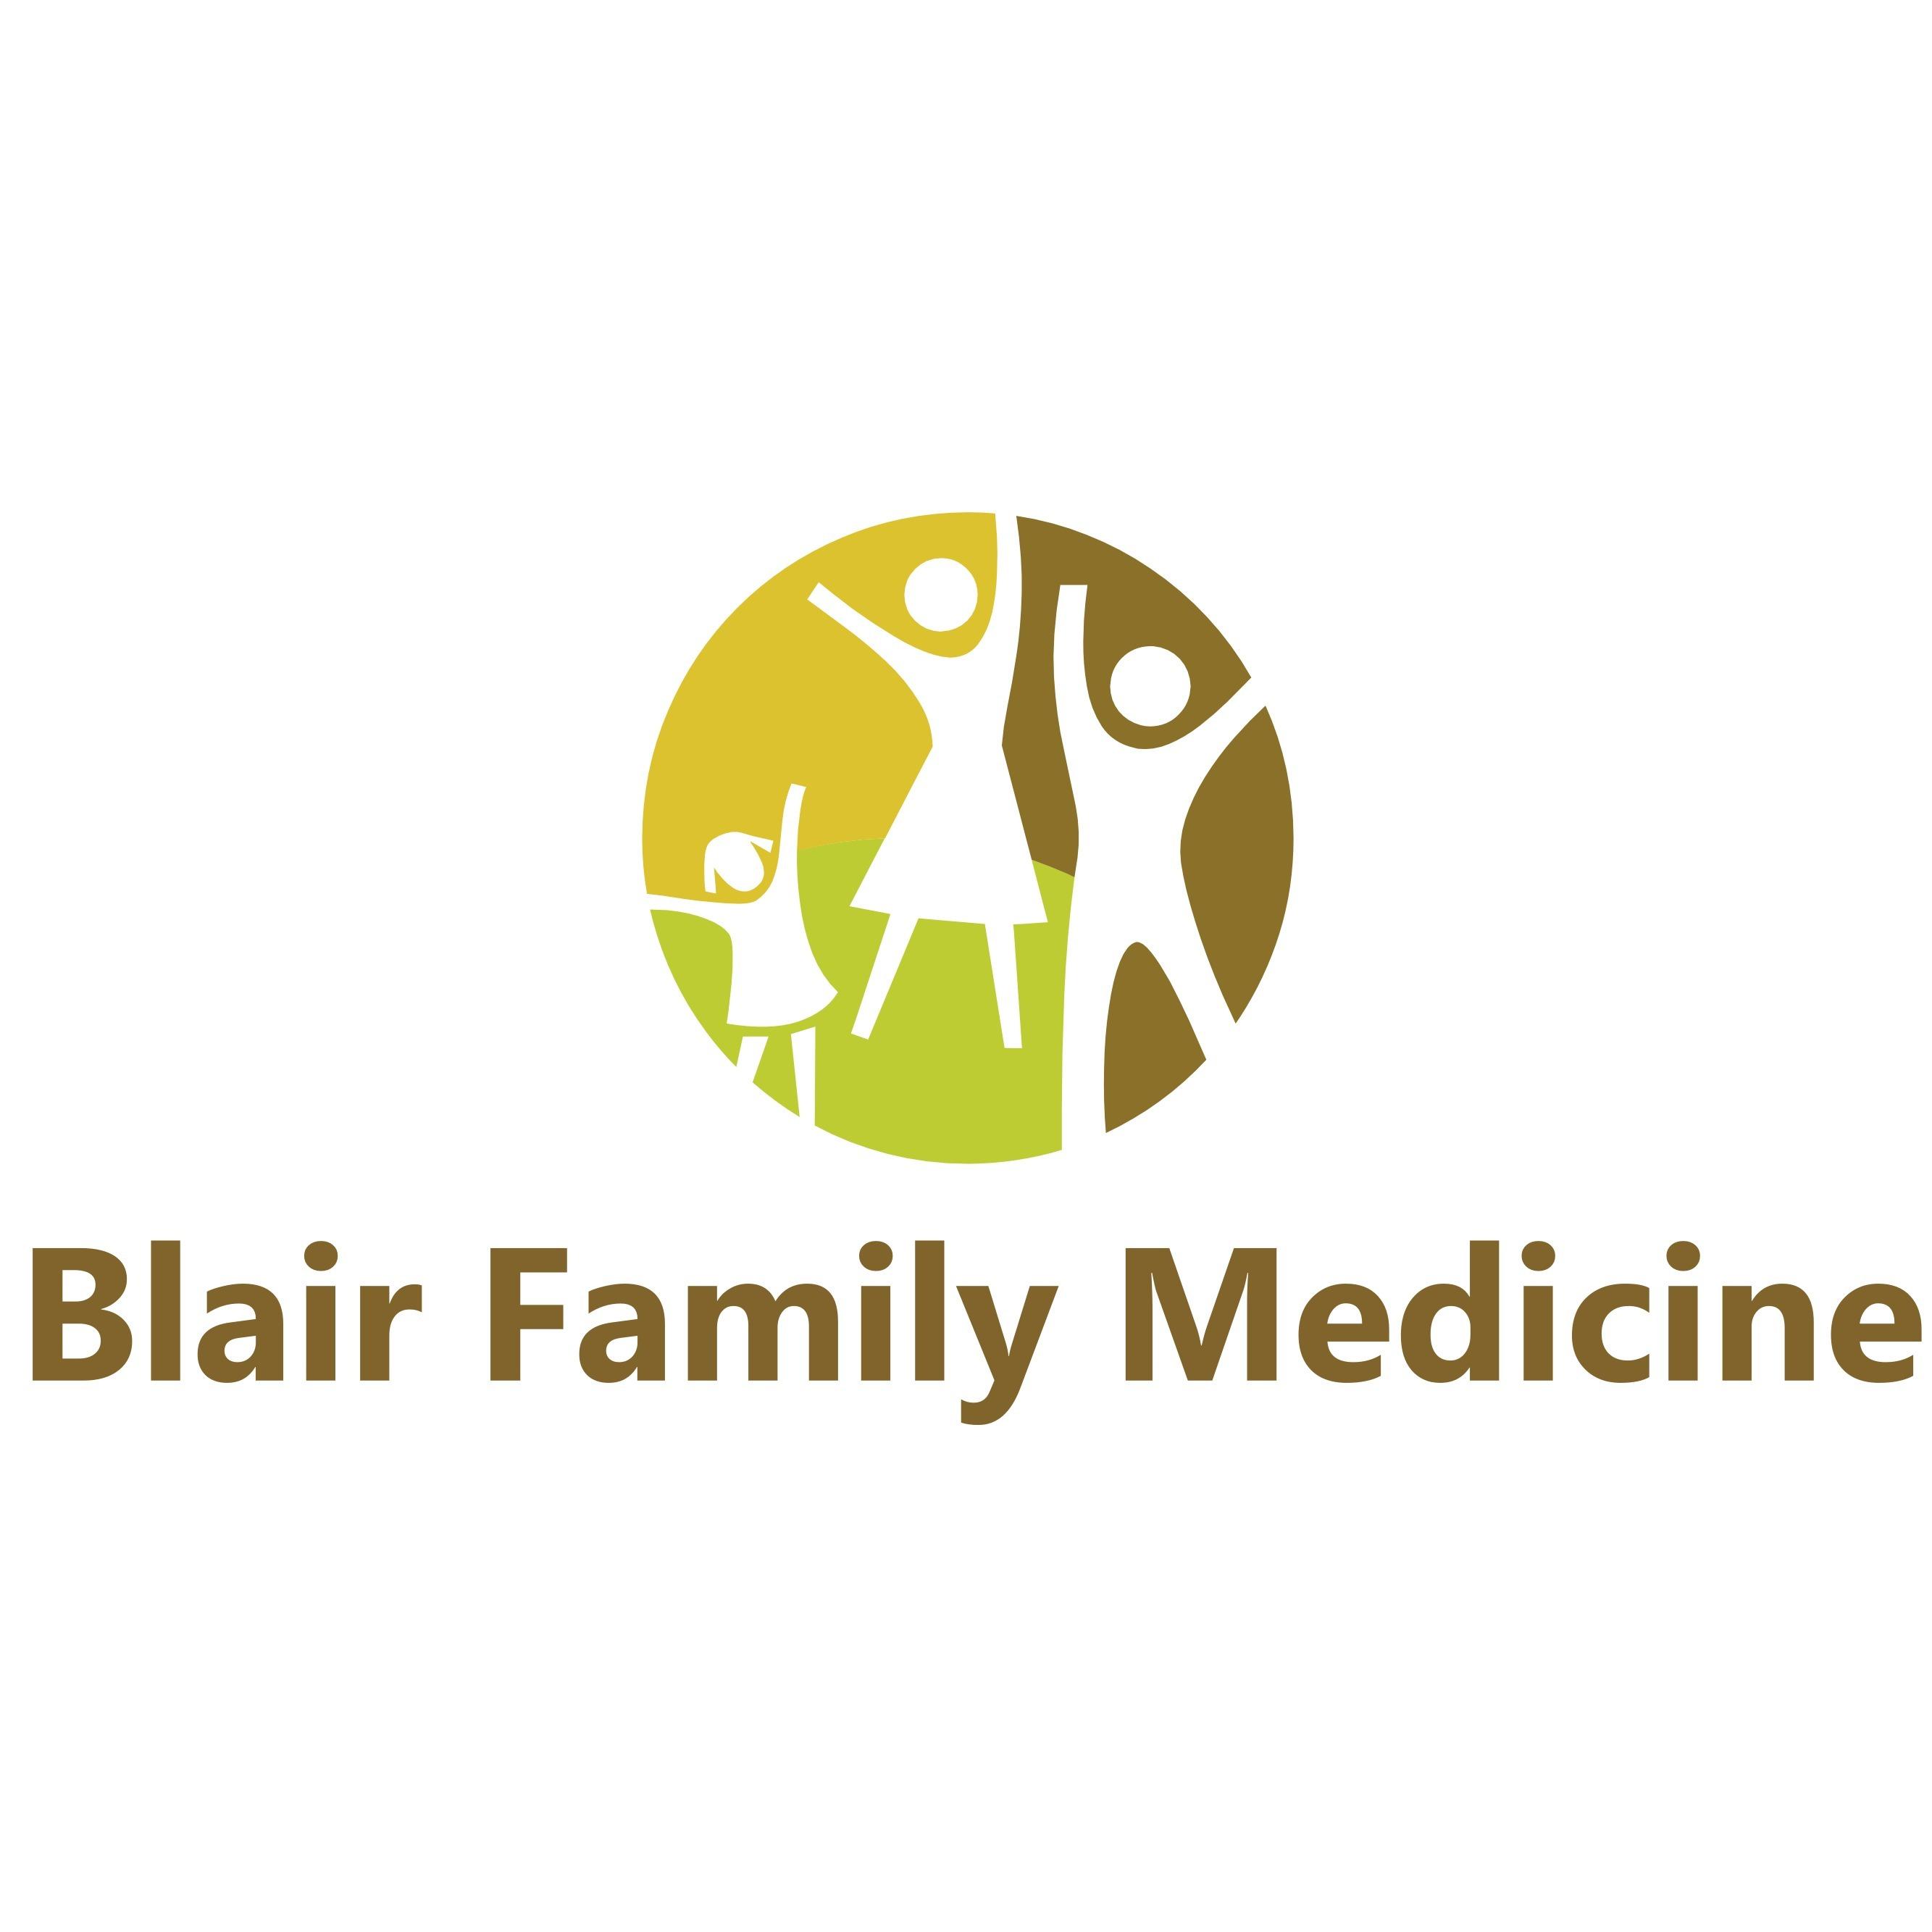 Blair Family Medicine